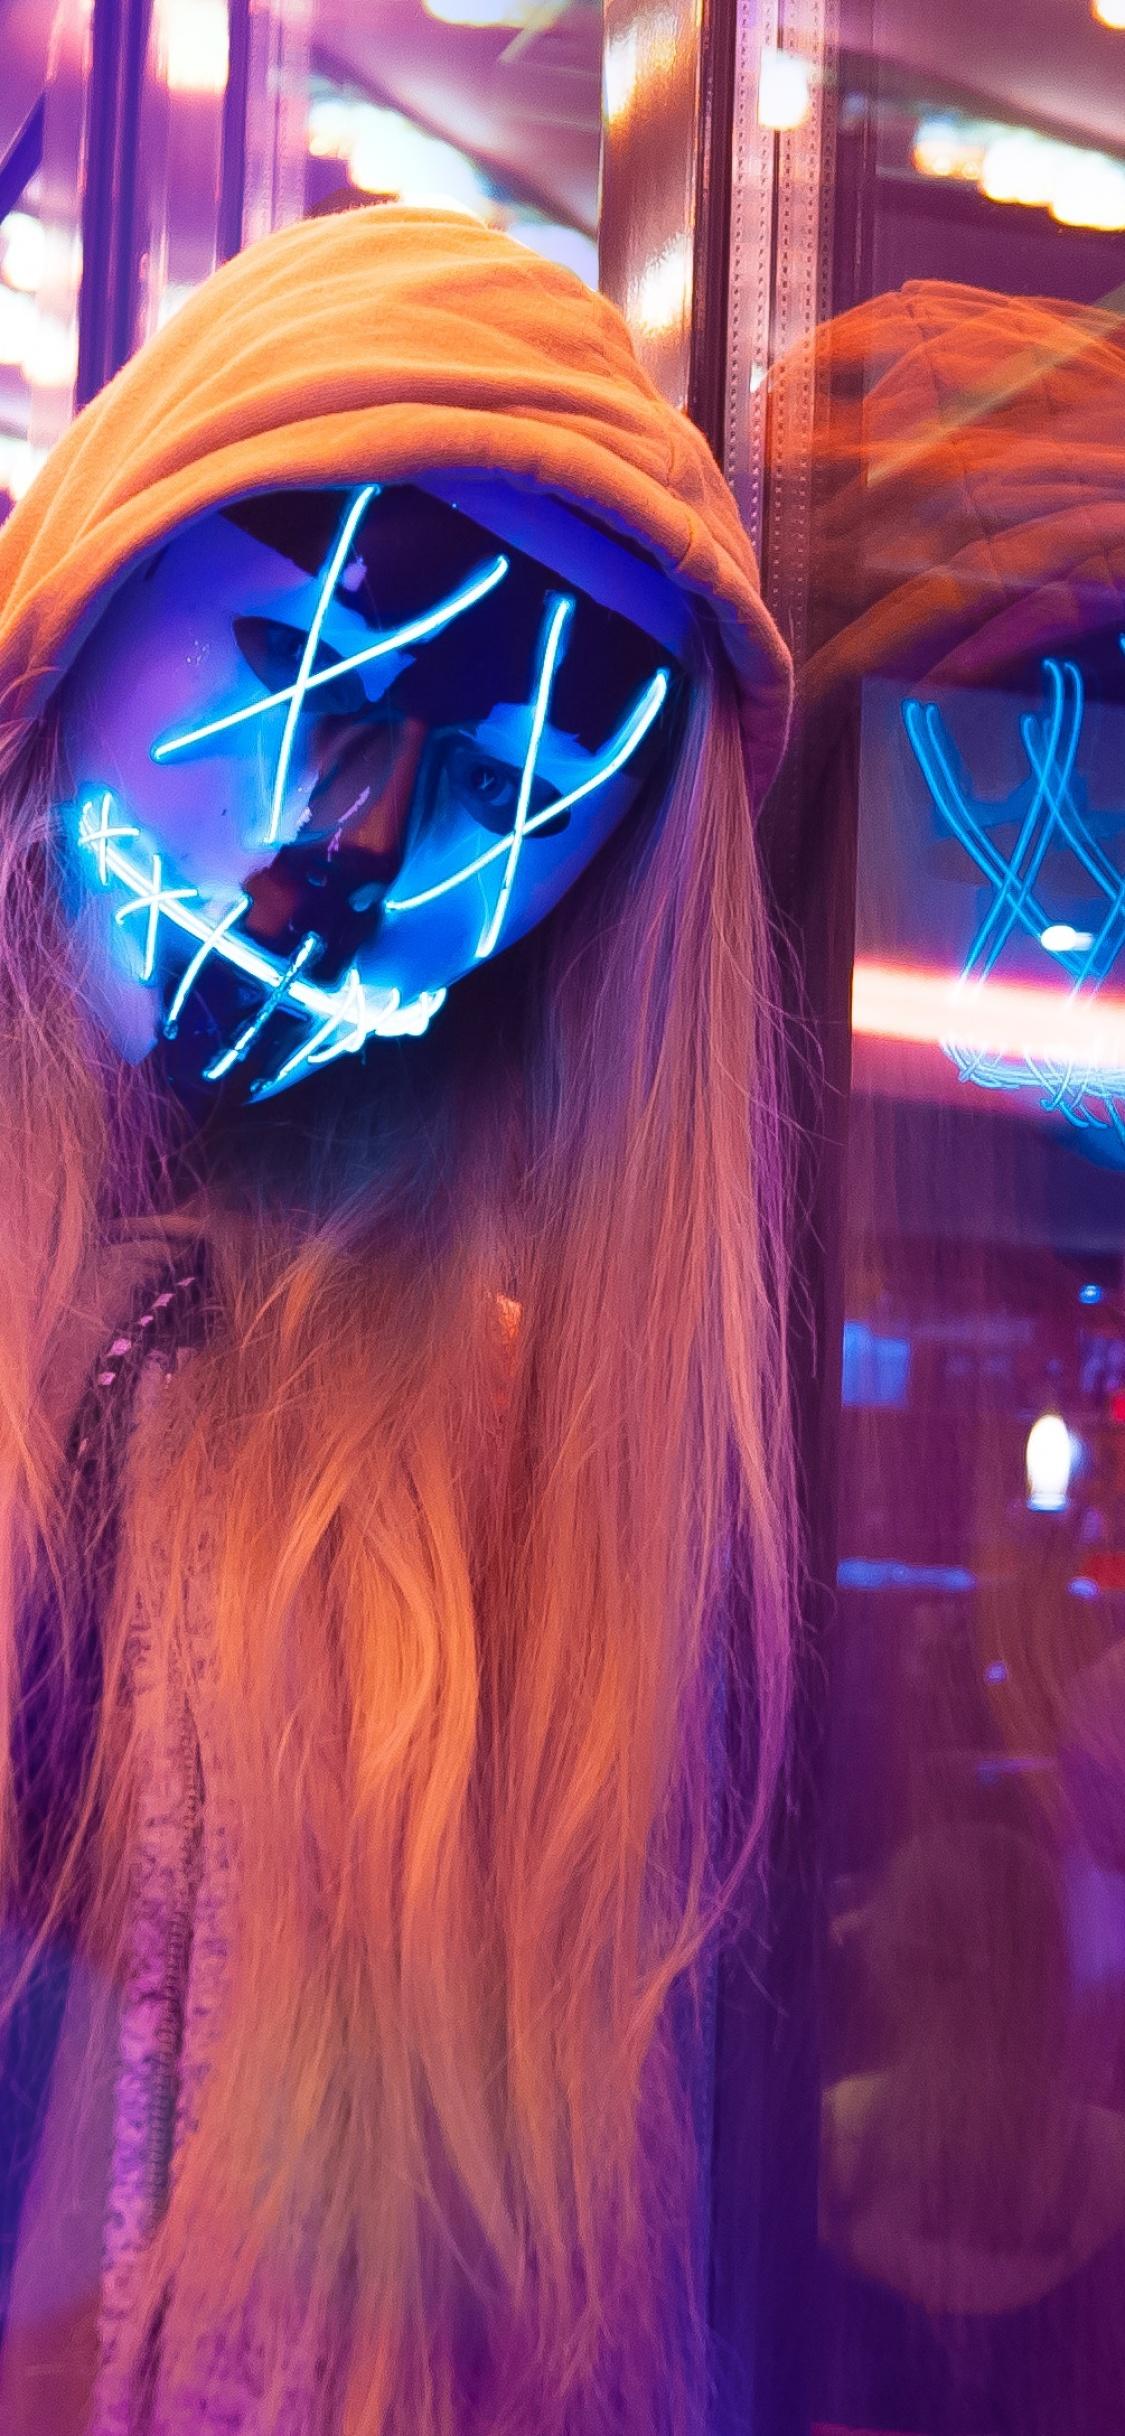 LED Mask 4K Wallpaper, Neon, Pink, Anonymous, Woman